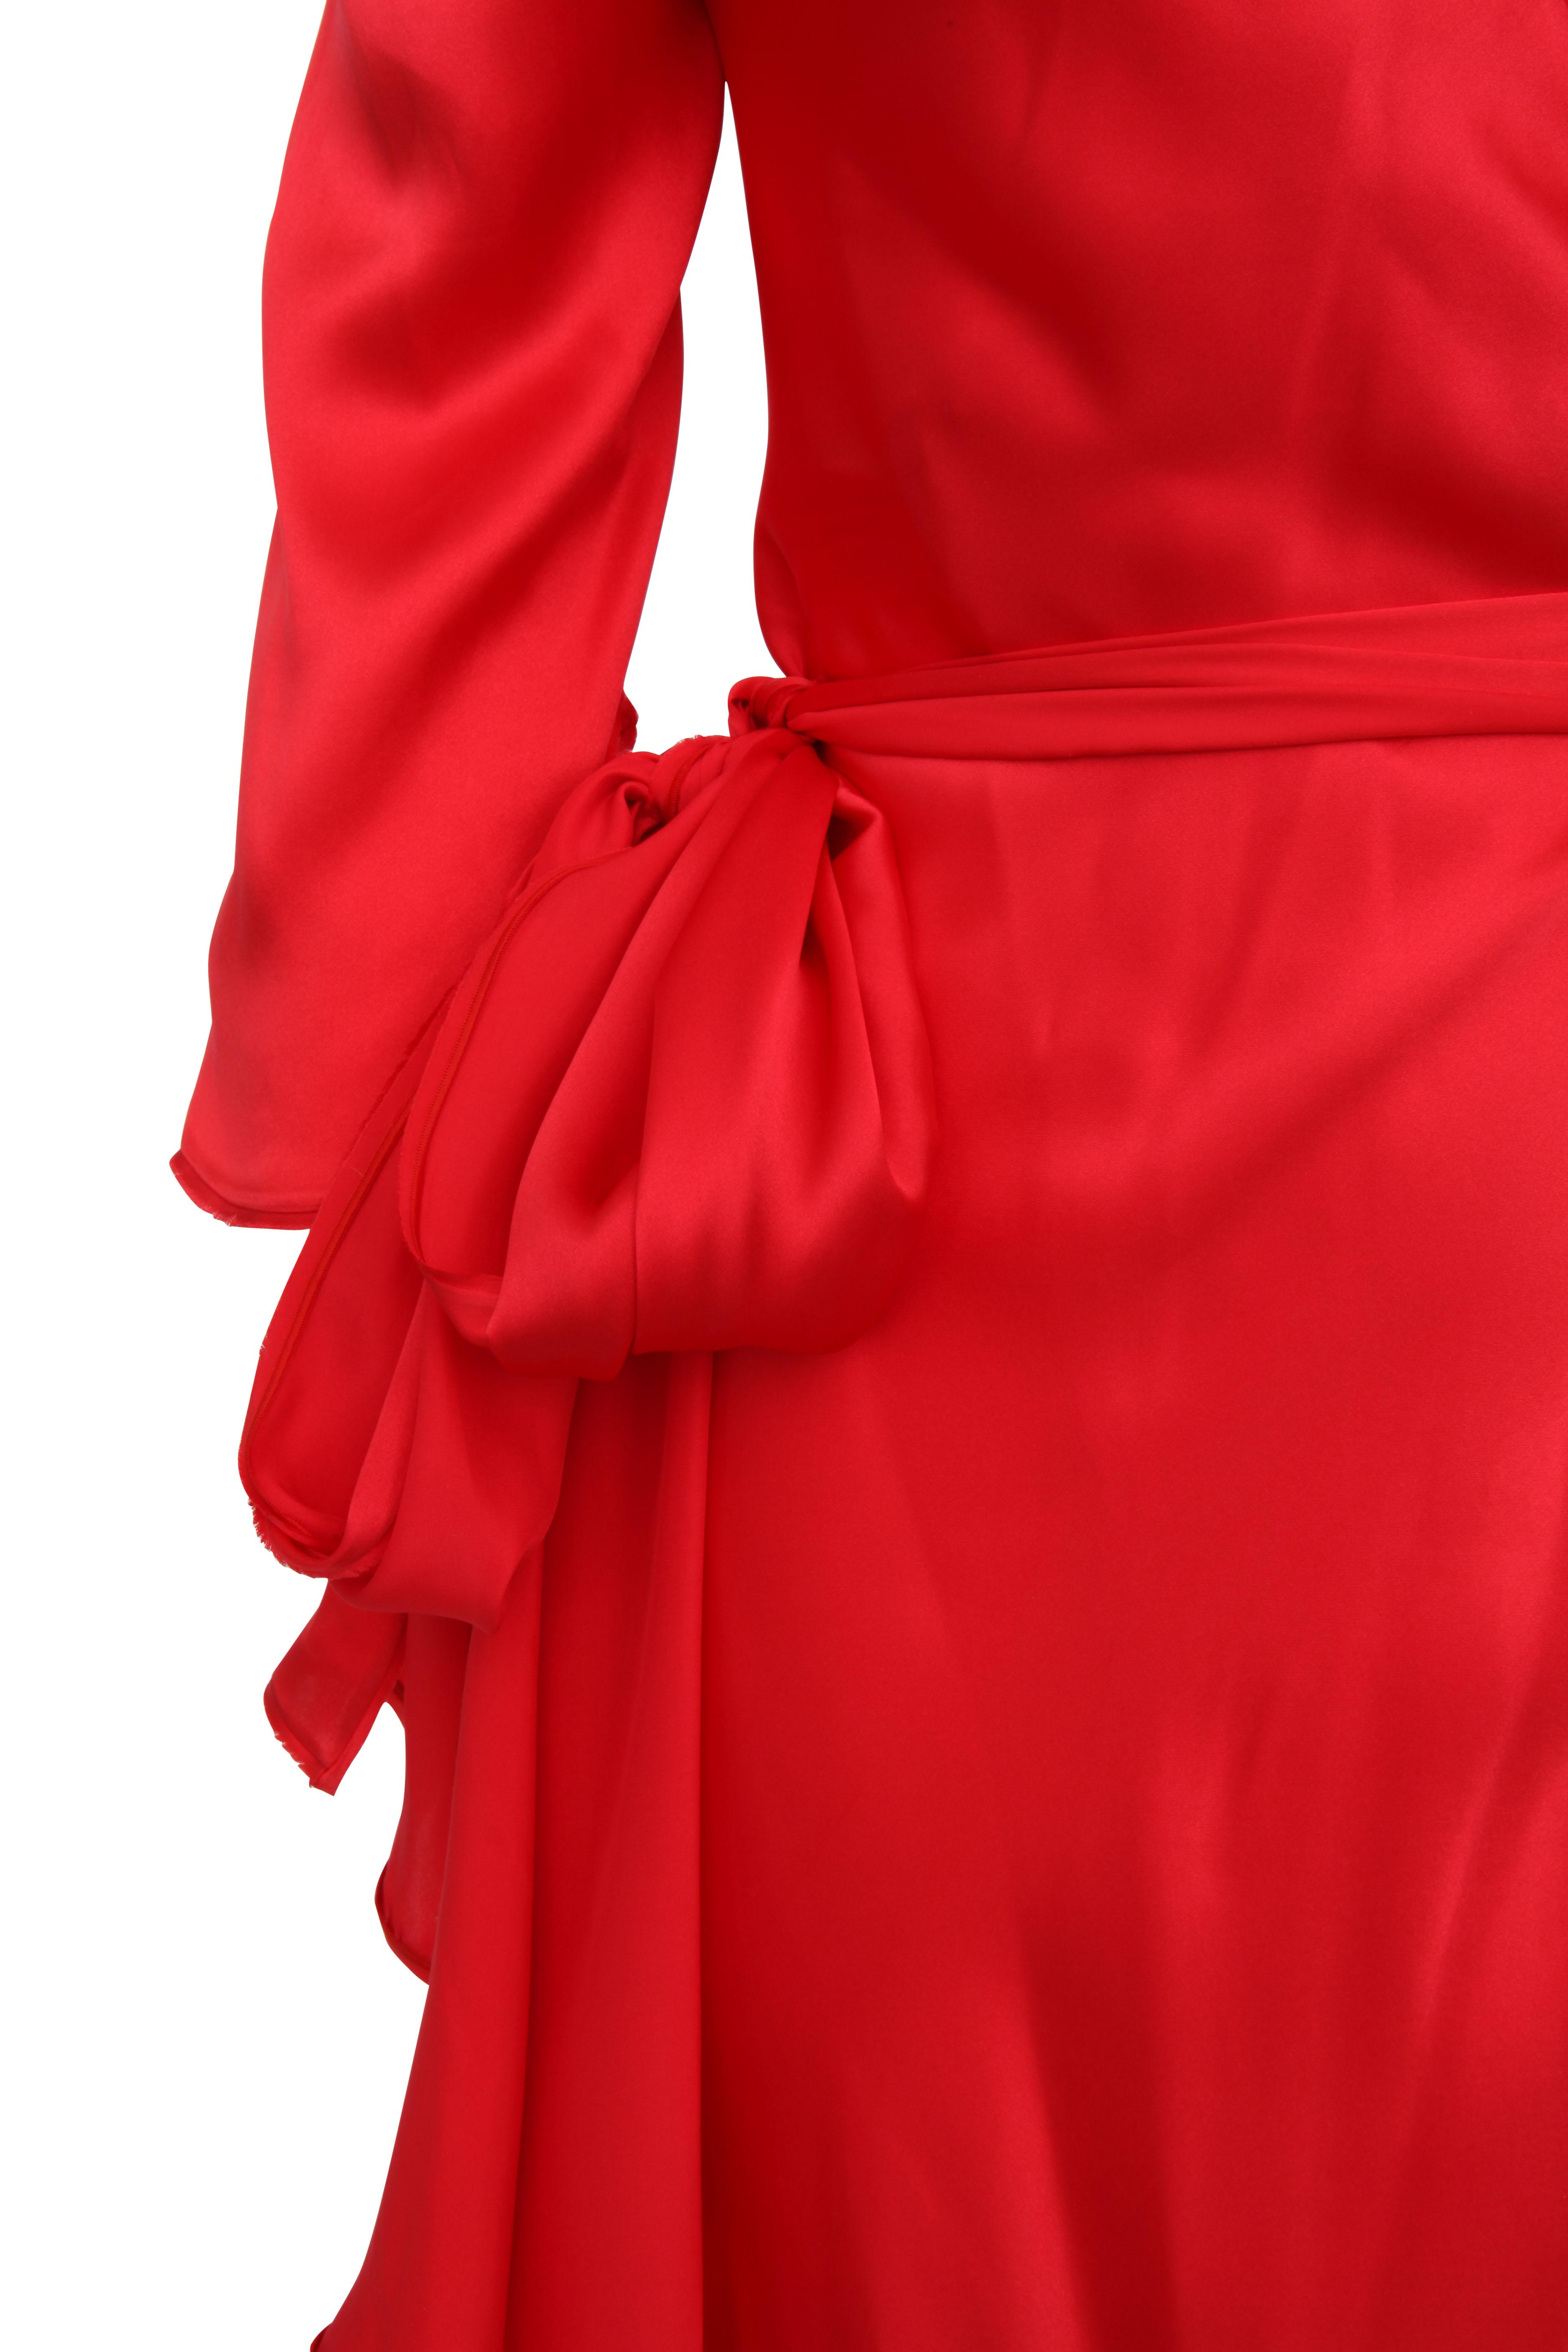 6970b7f74bf0 Maria Lucia Hohan Dress - Maria Lucia Hohan - Michele Franzese Moda